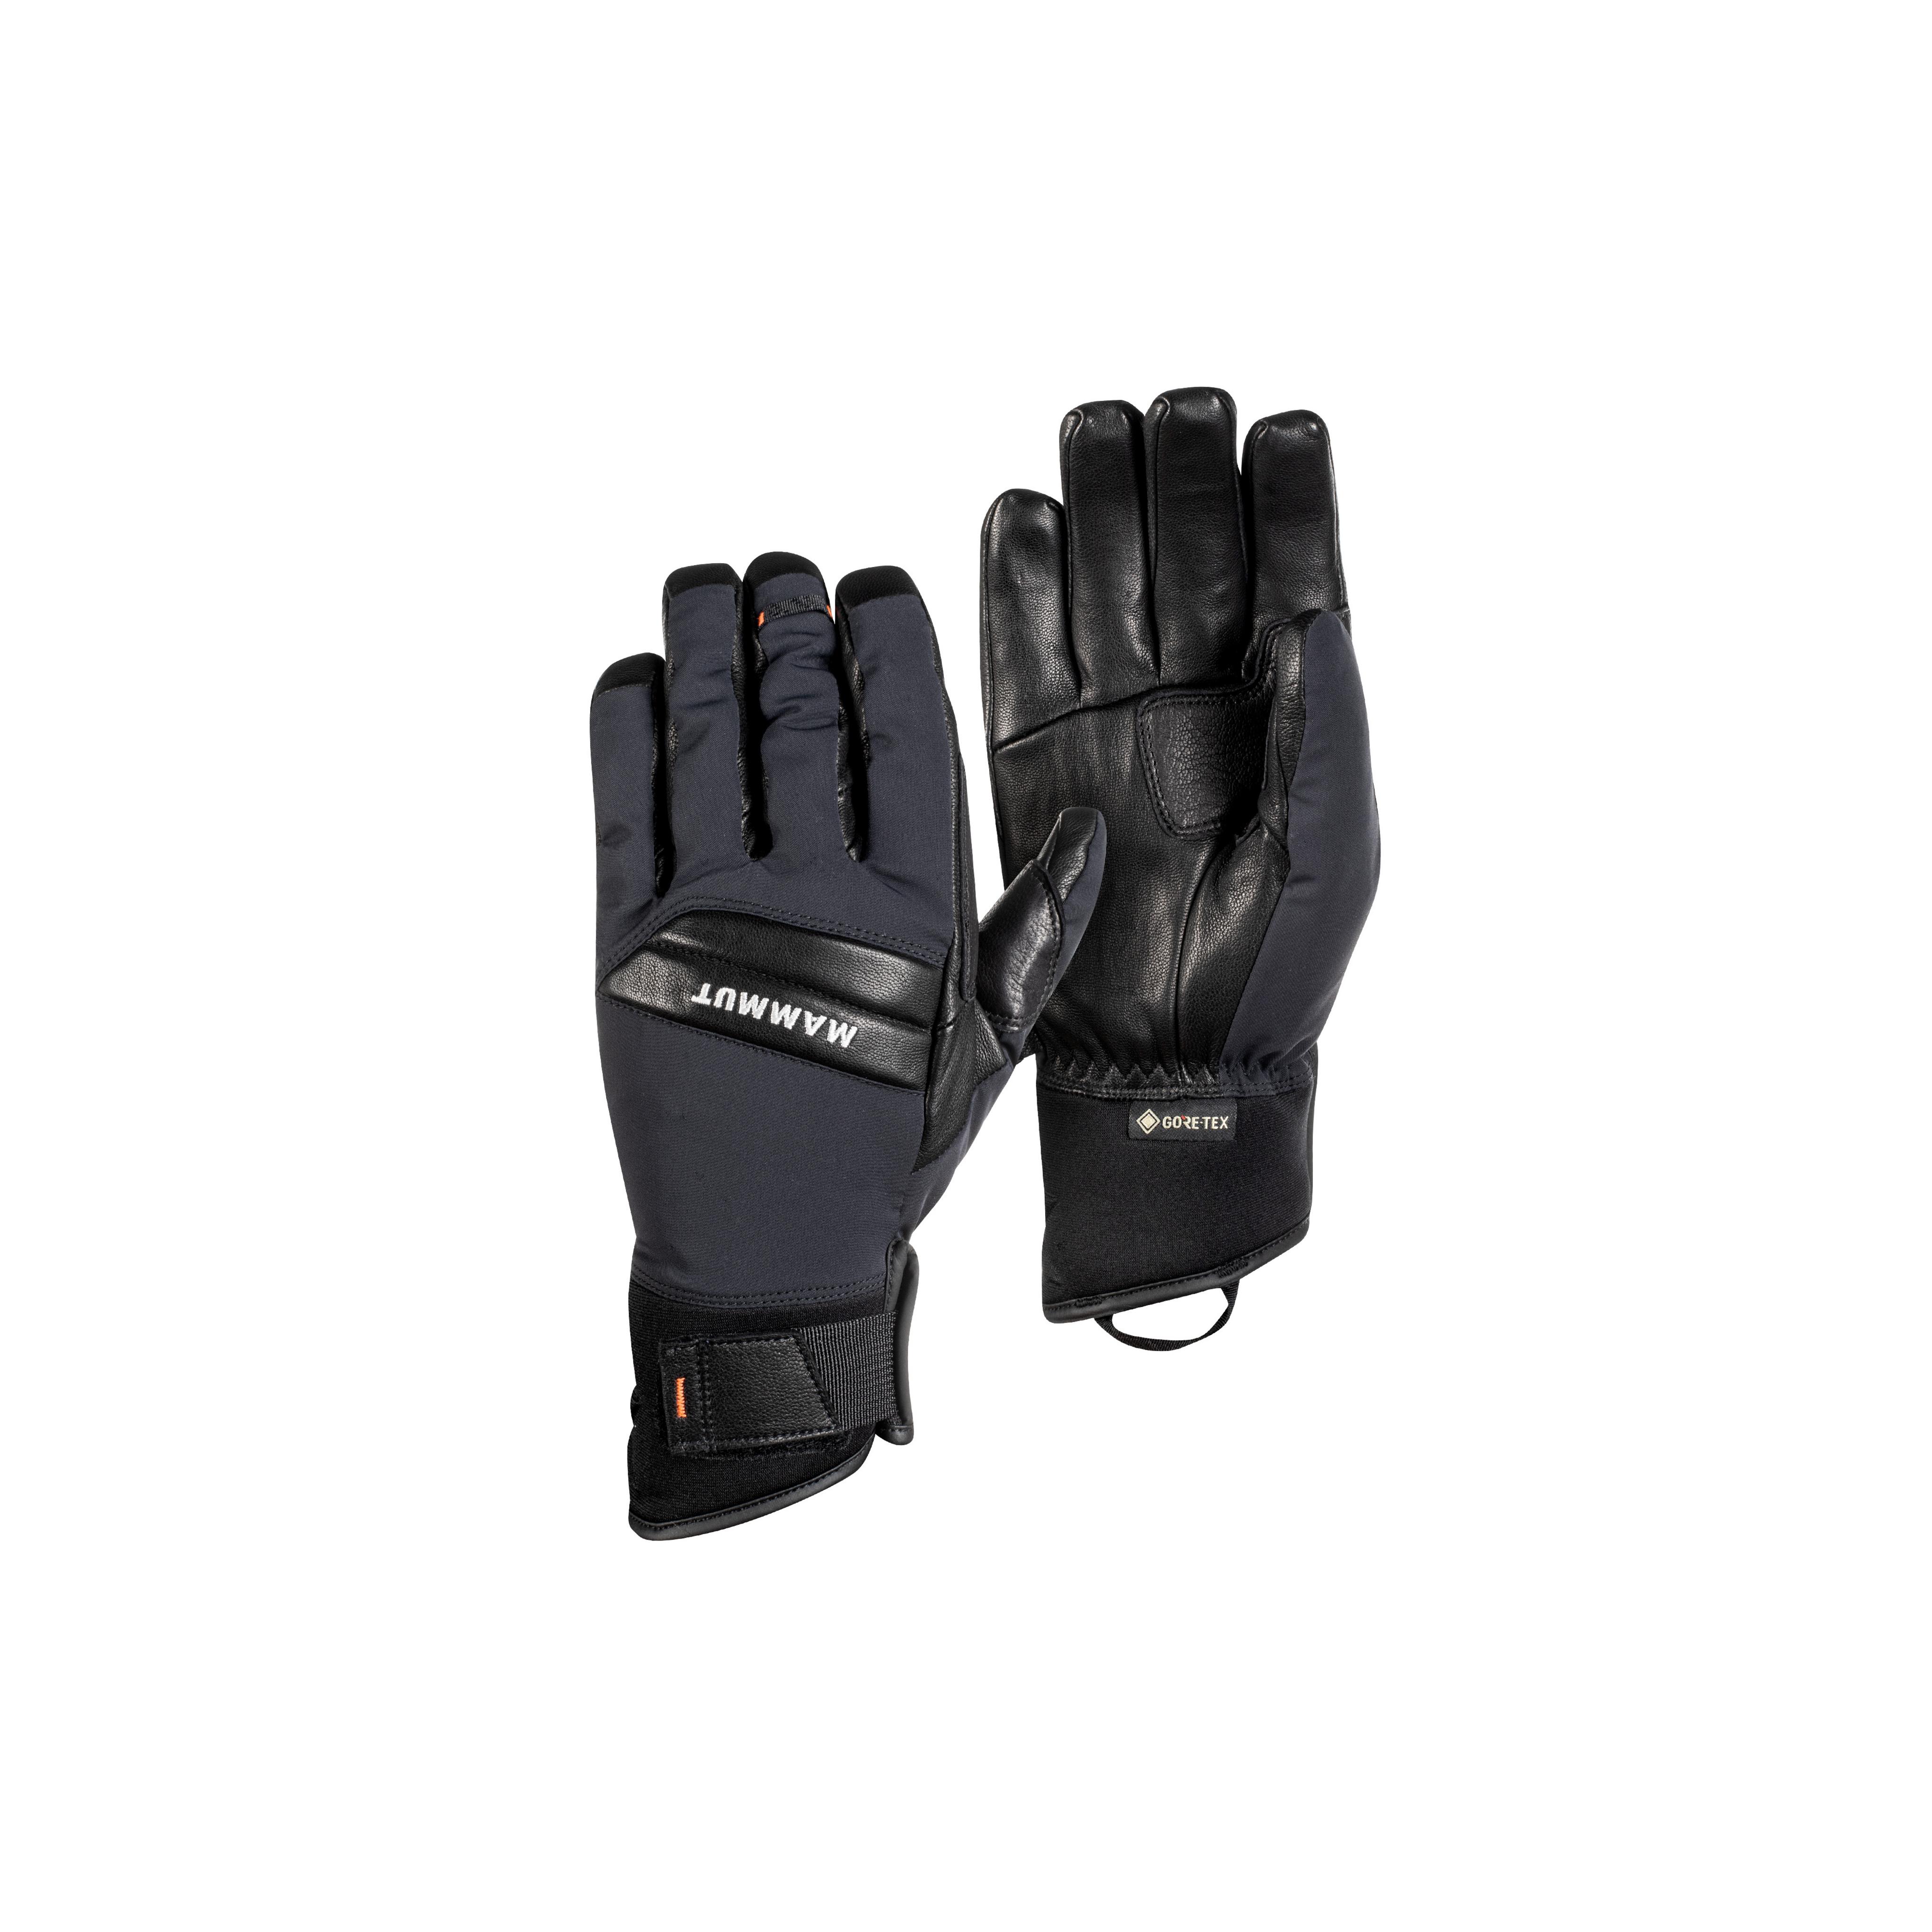 Nordwand Pro Glove - 6, black thumbnail